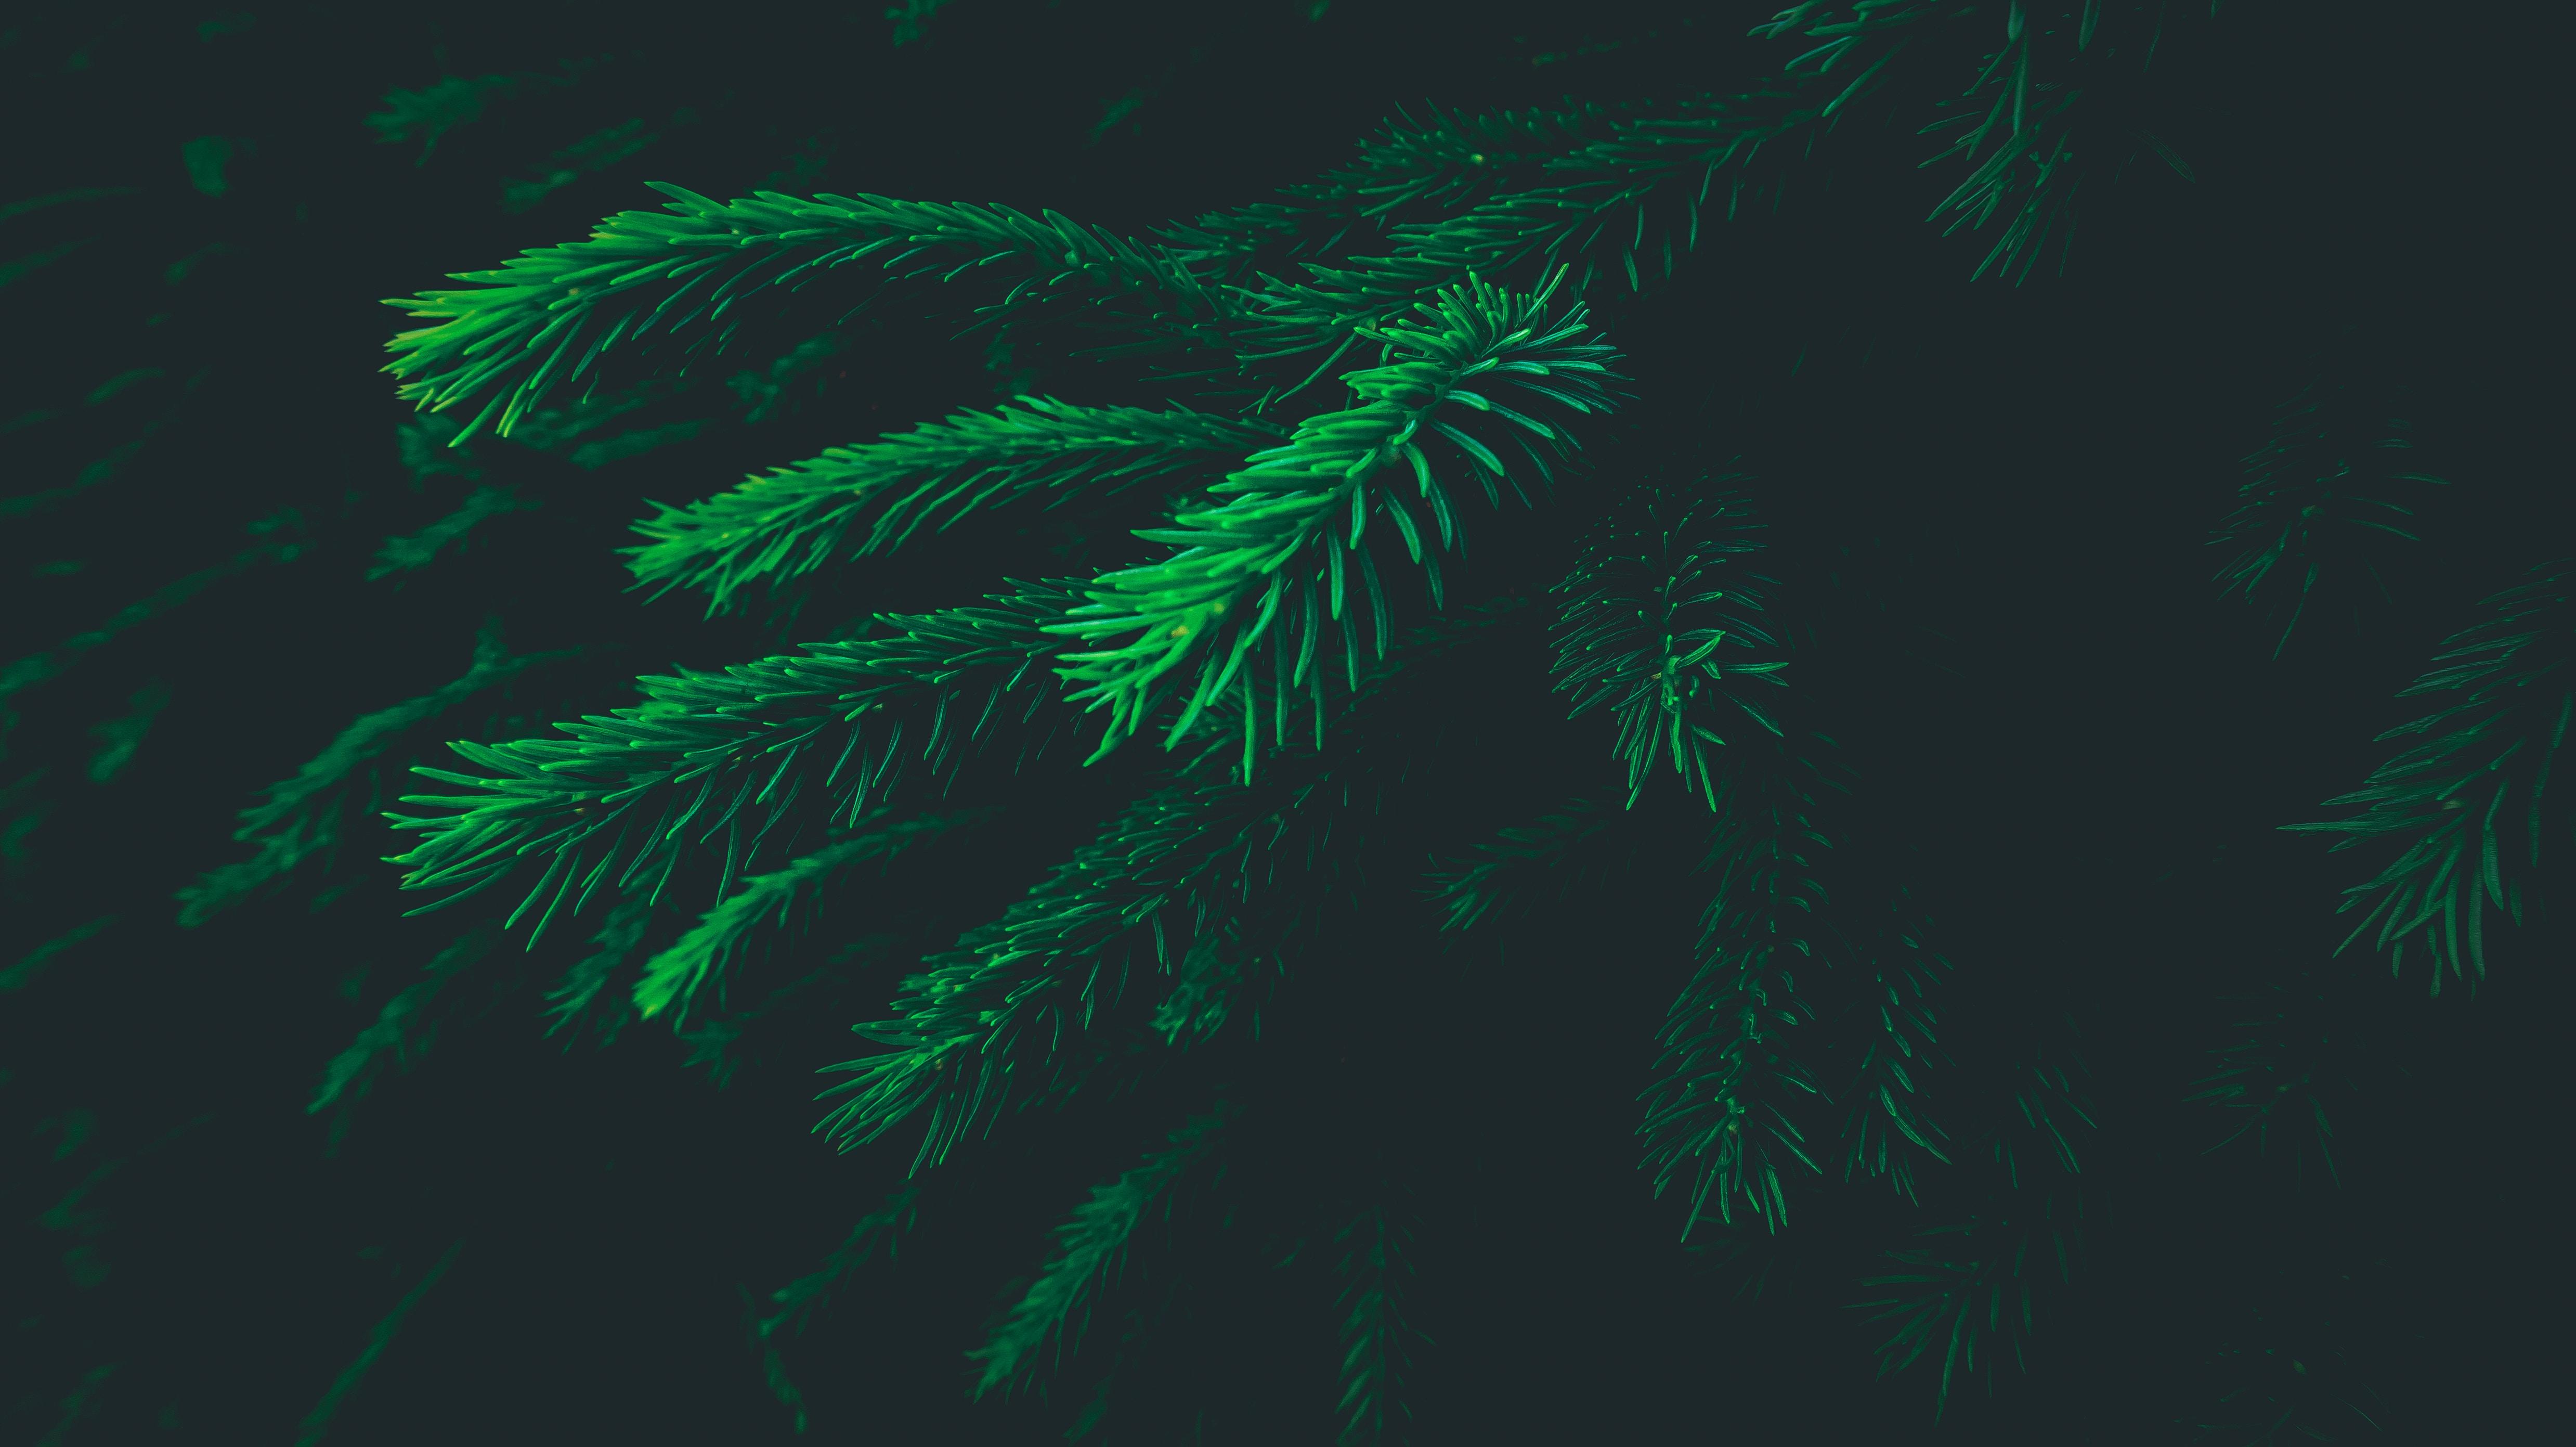 macro shot photography of green plants